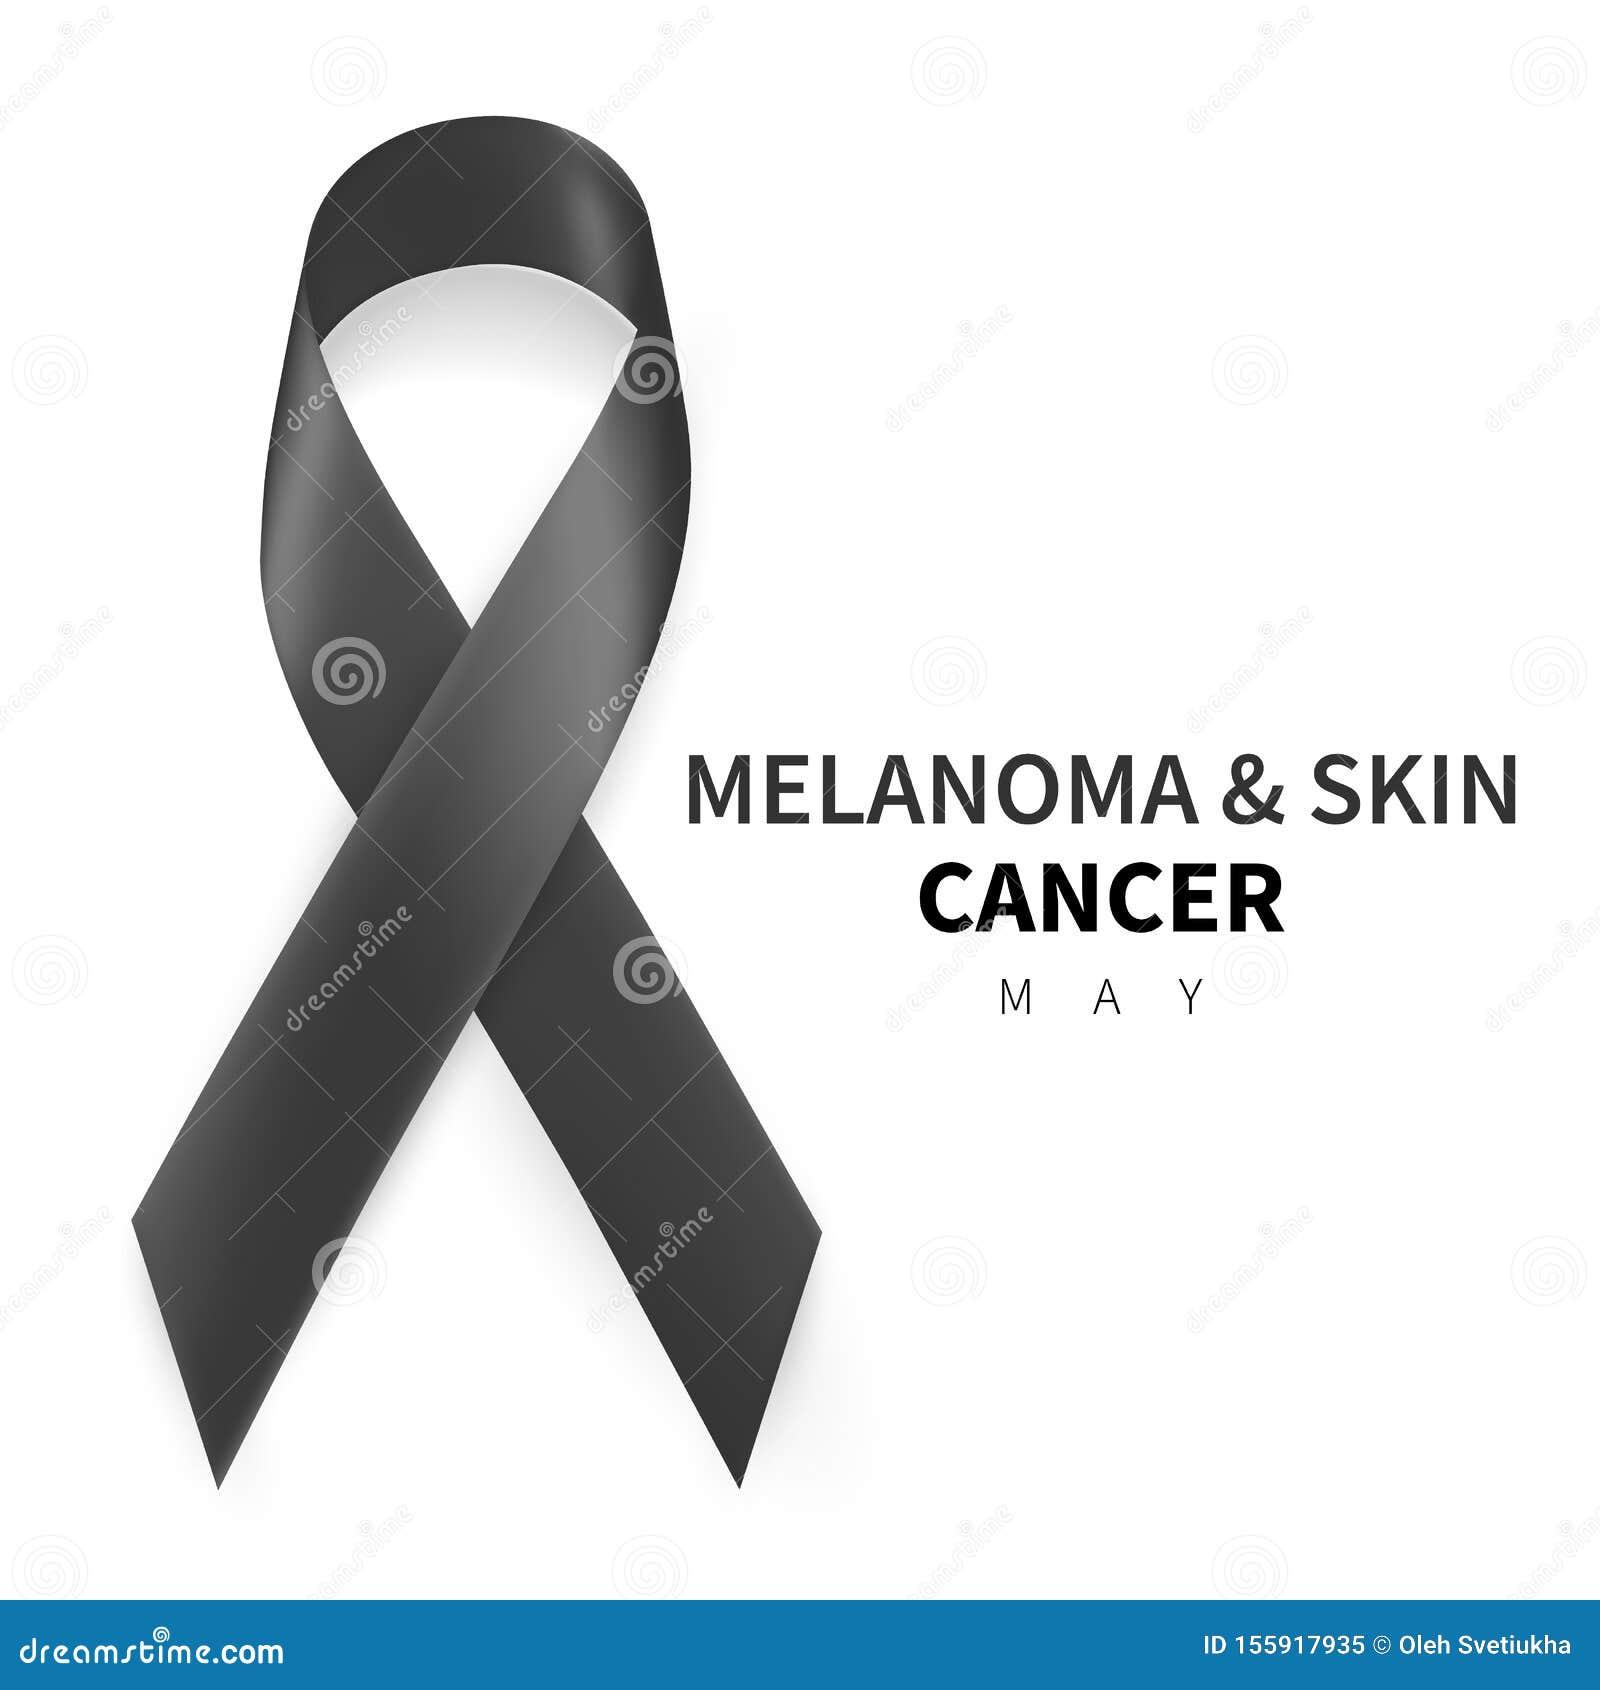 Melanoma and Skin Cancer Awareness Month. Realistic Black ribbon symbol. Medical Design. Vector illustration